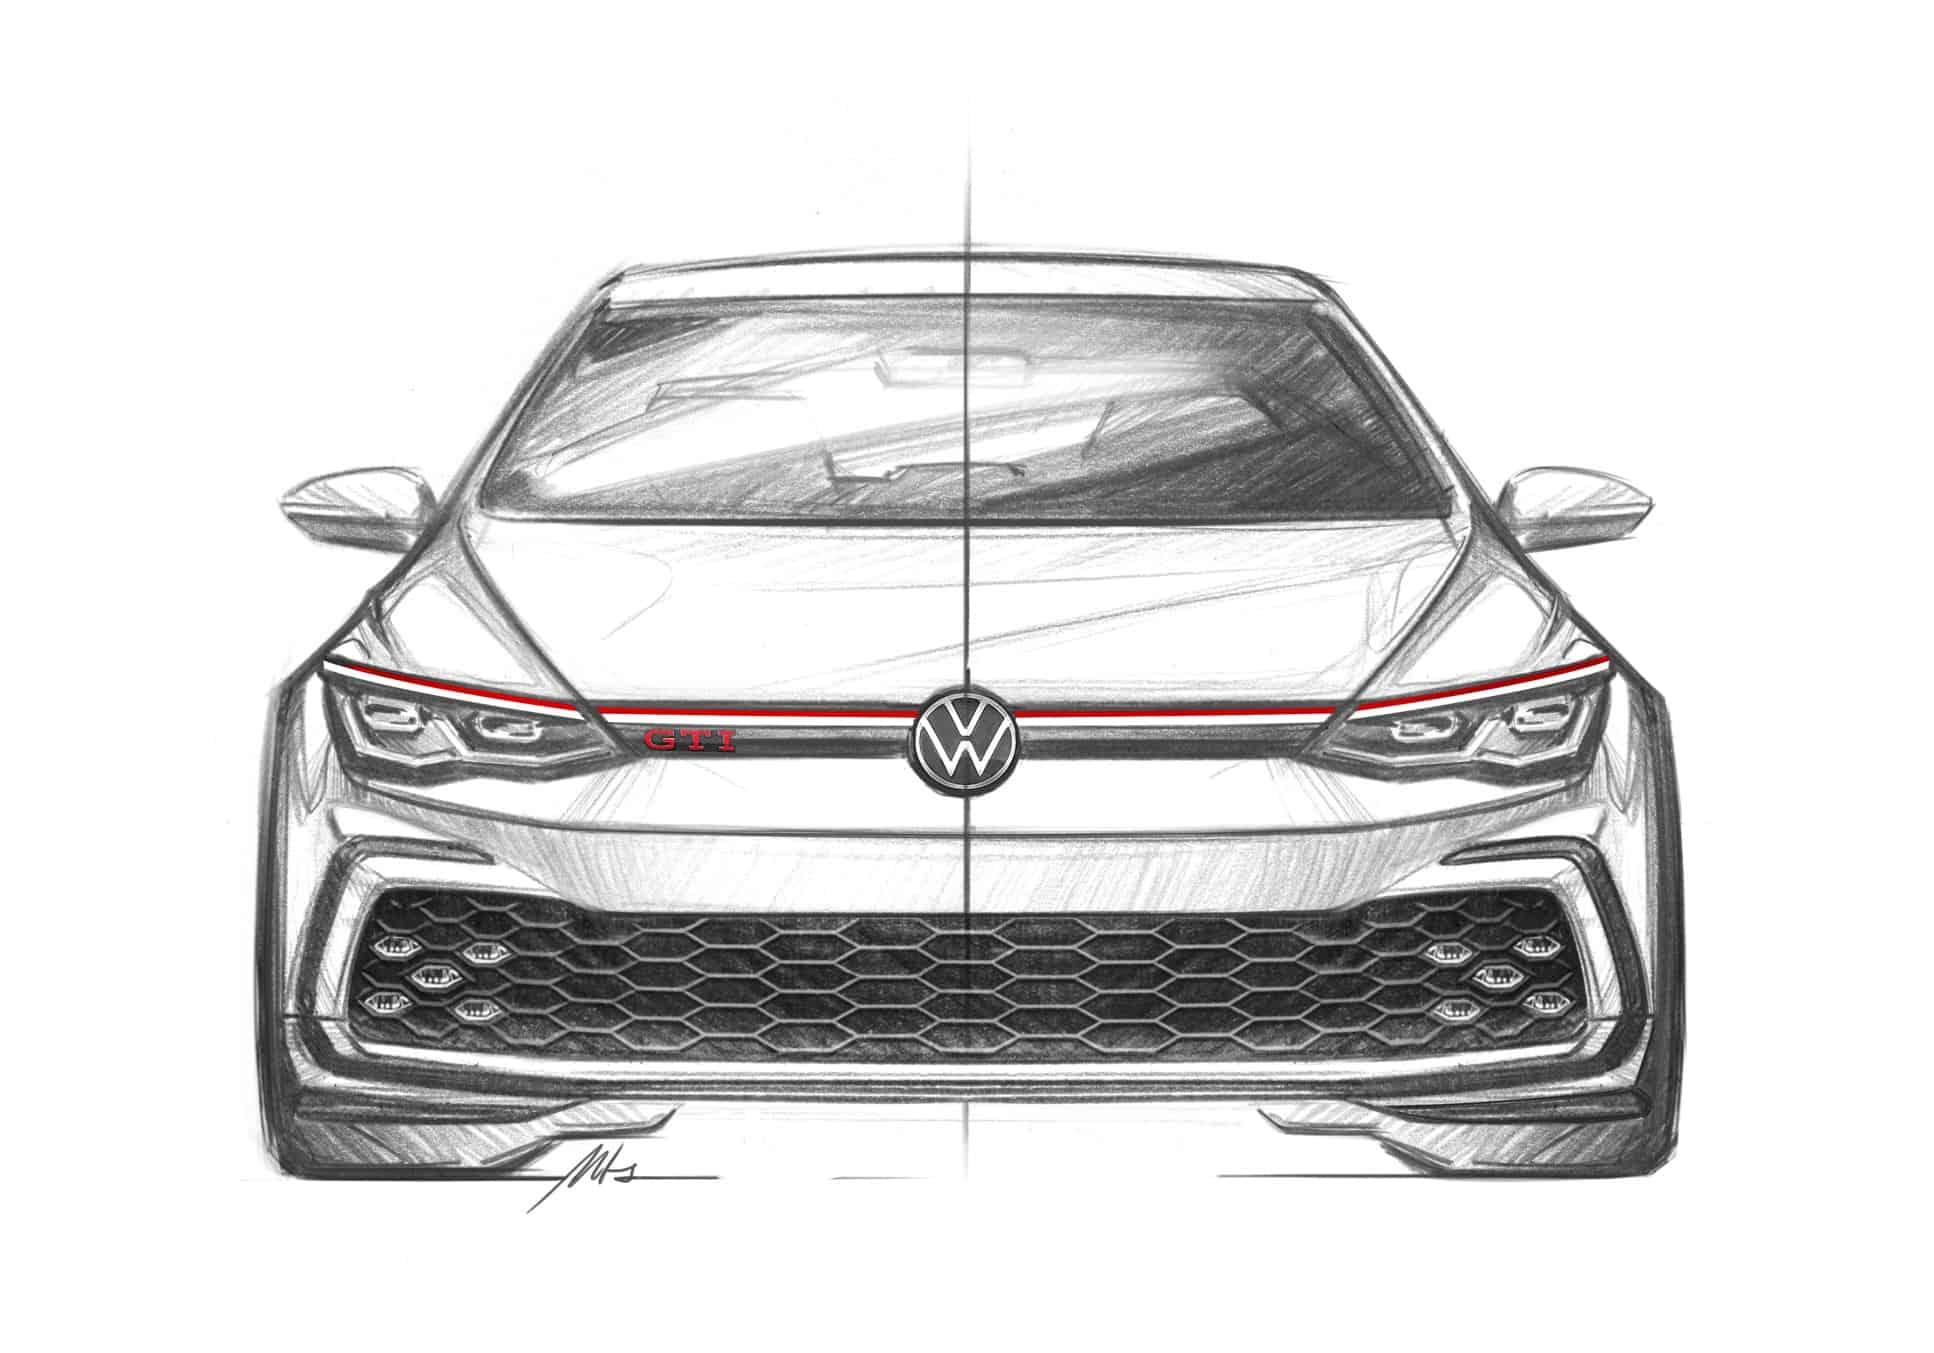 VW GTI Mk8 sketch